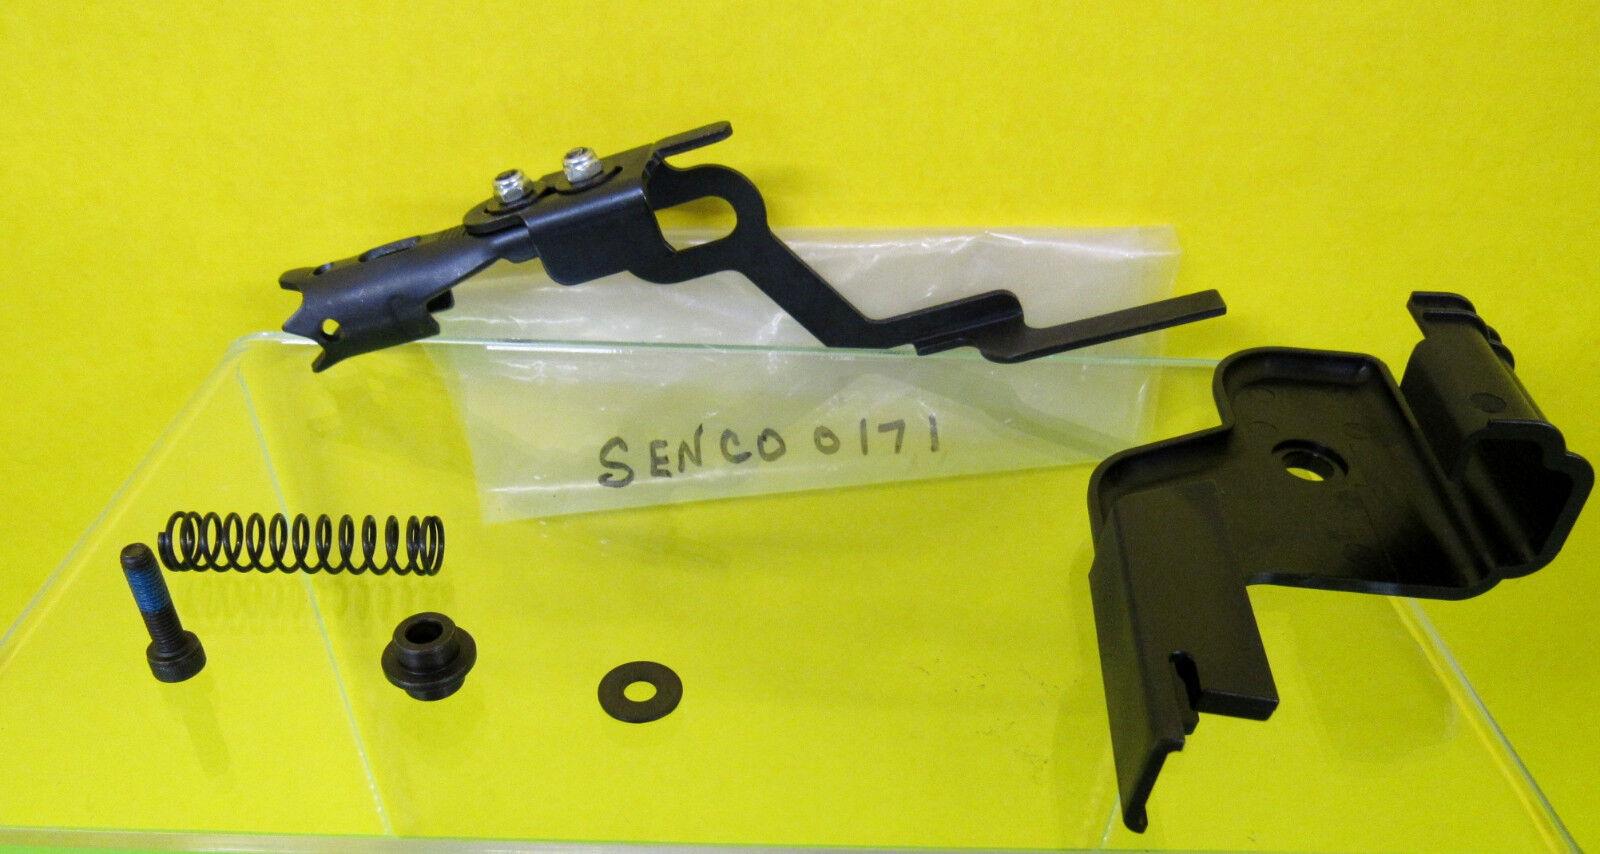 SENCO PartSENCO0171 SAFETY ASSEMBLY for FramePro 601 & 651 Nailer New (2IEC)